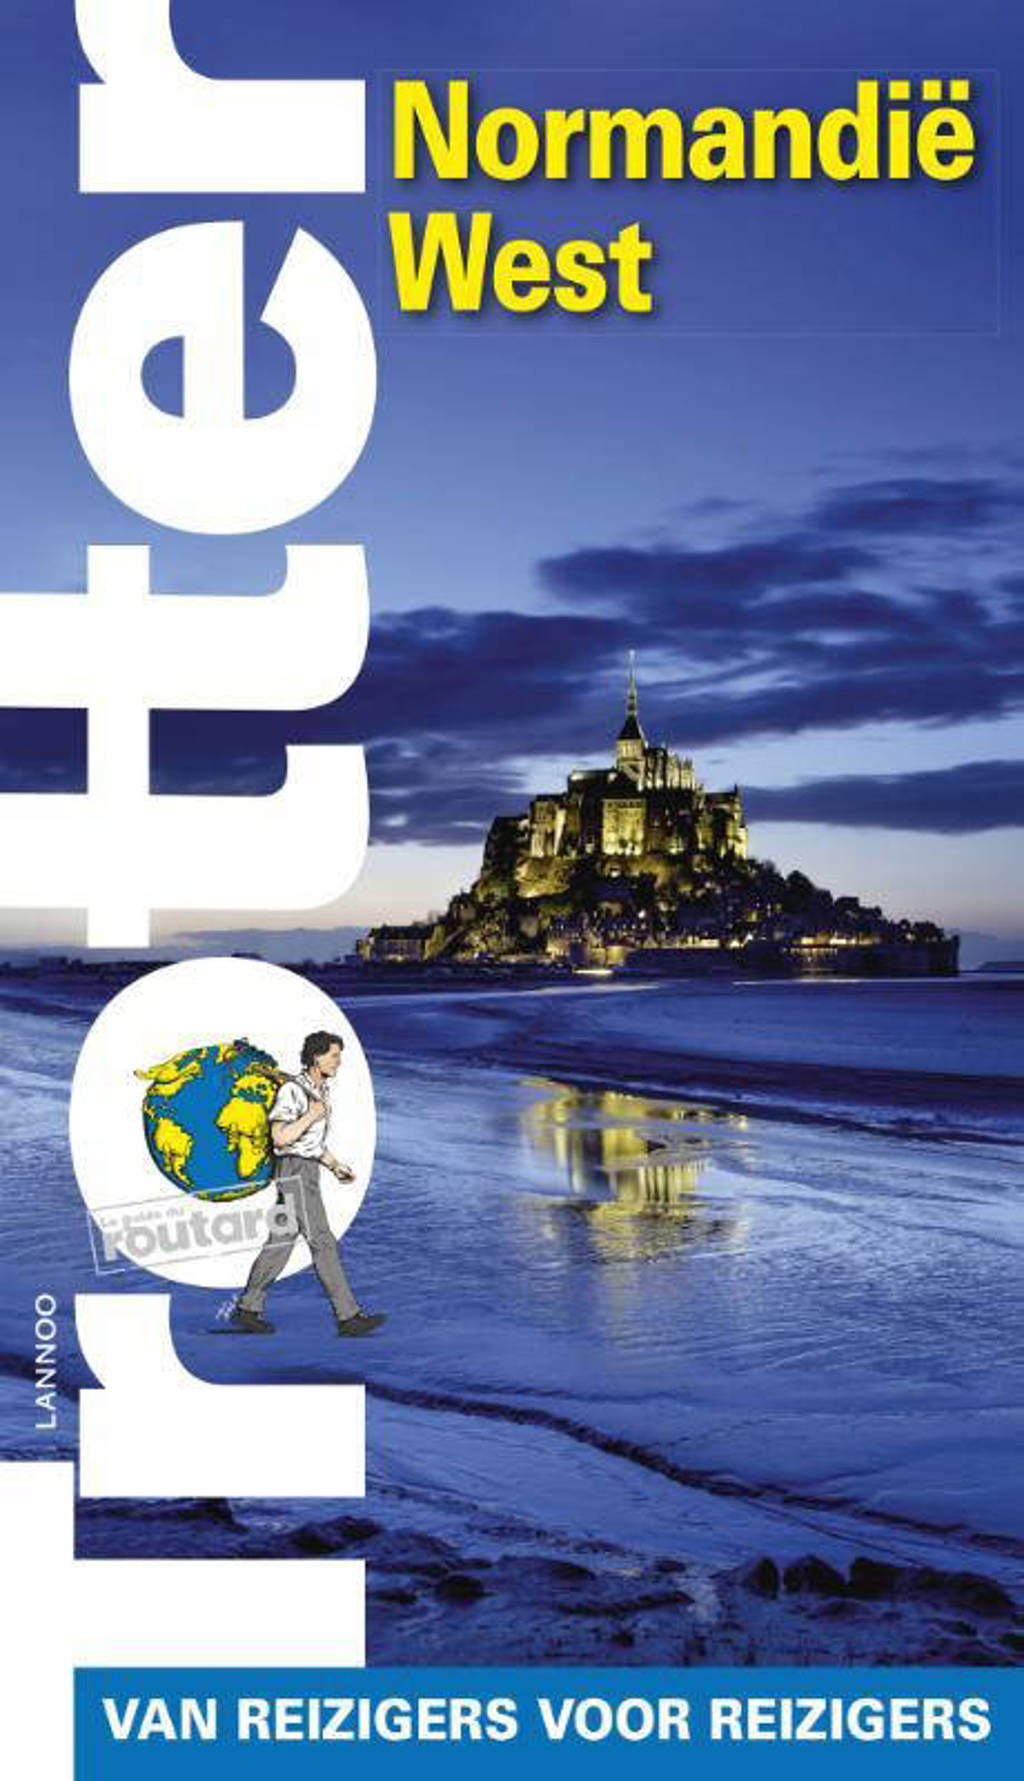 Trotter: Normandie West